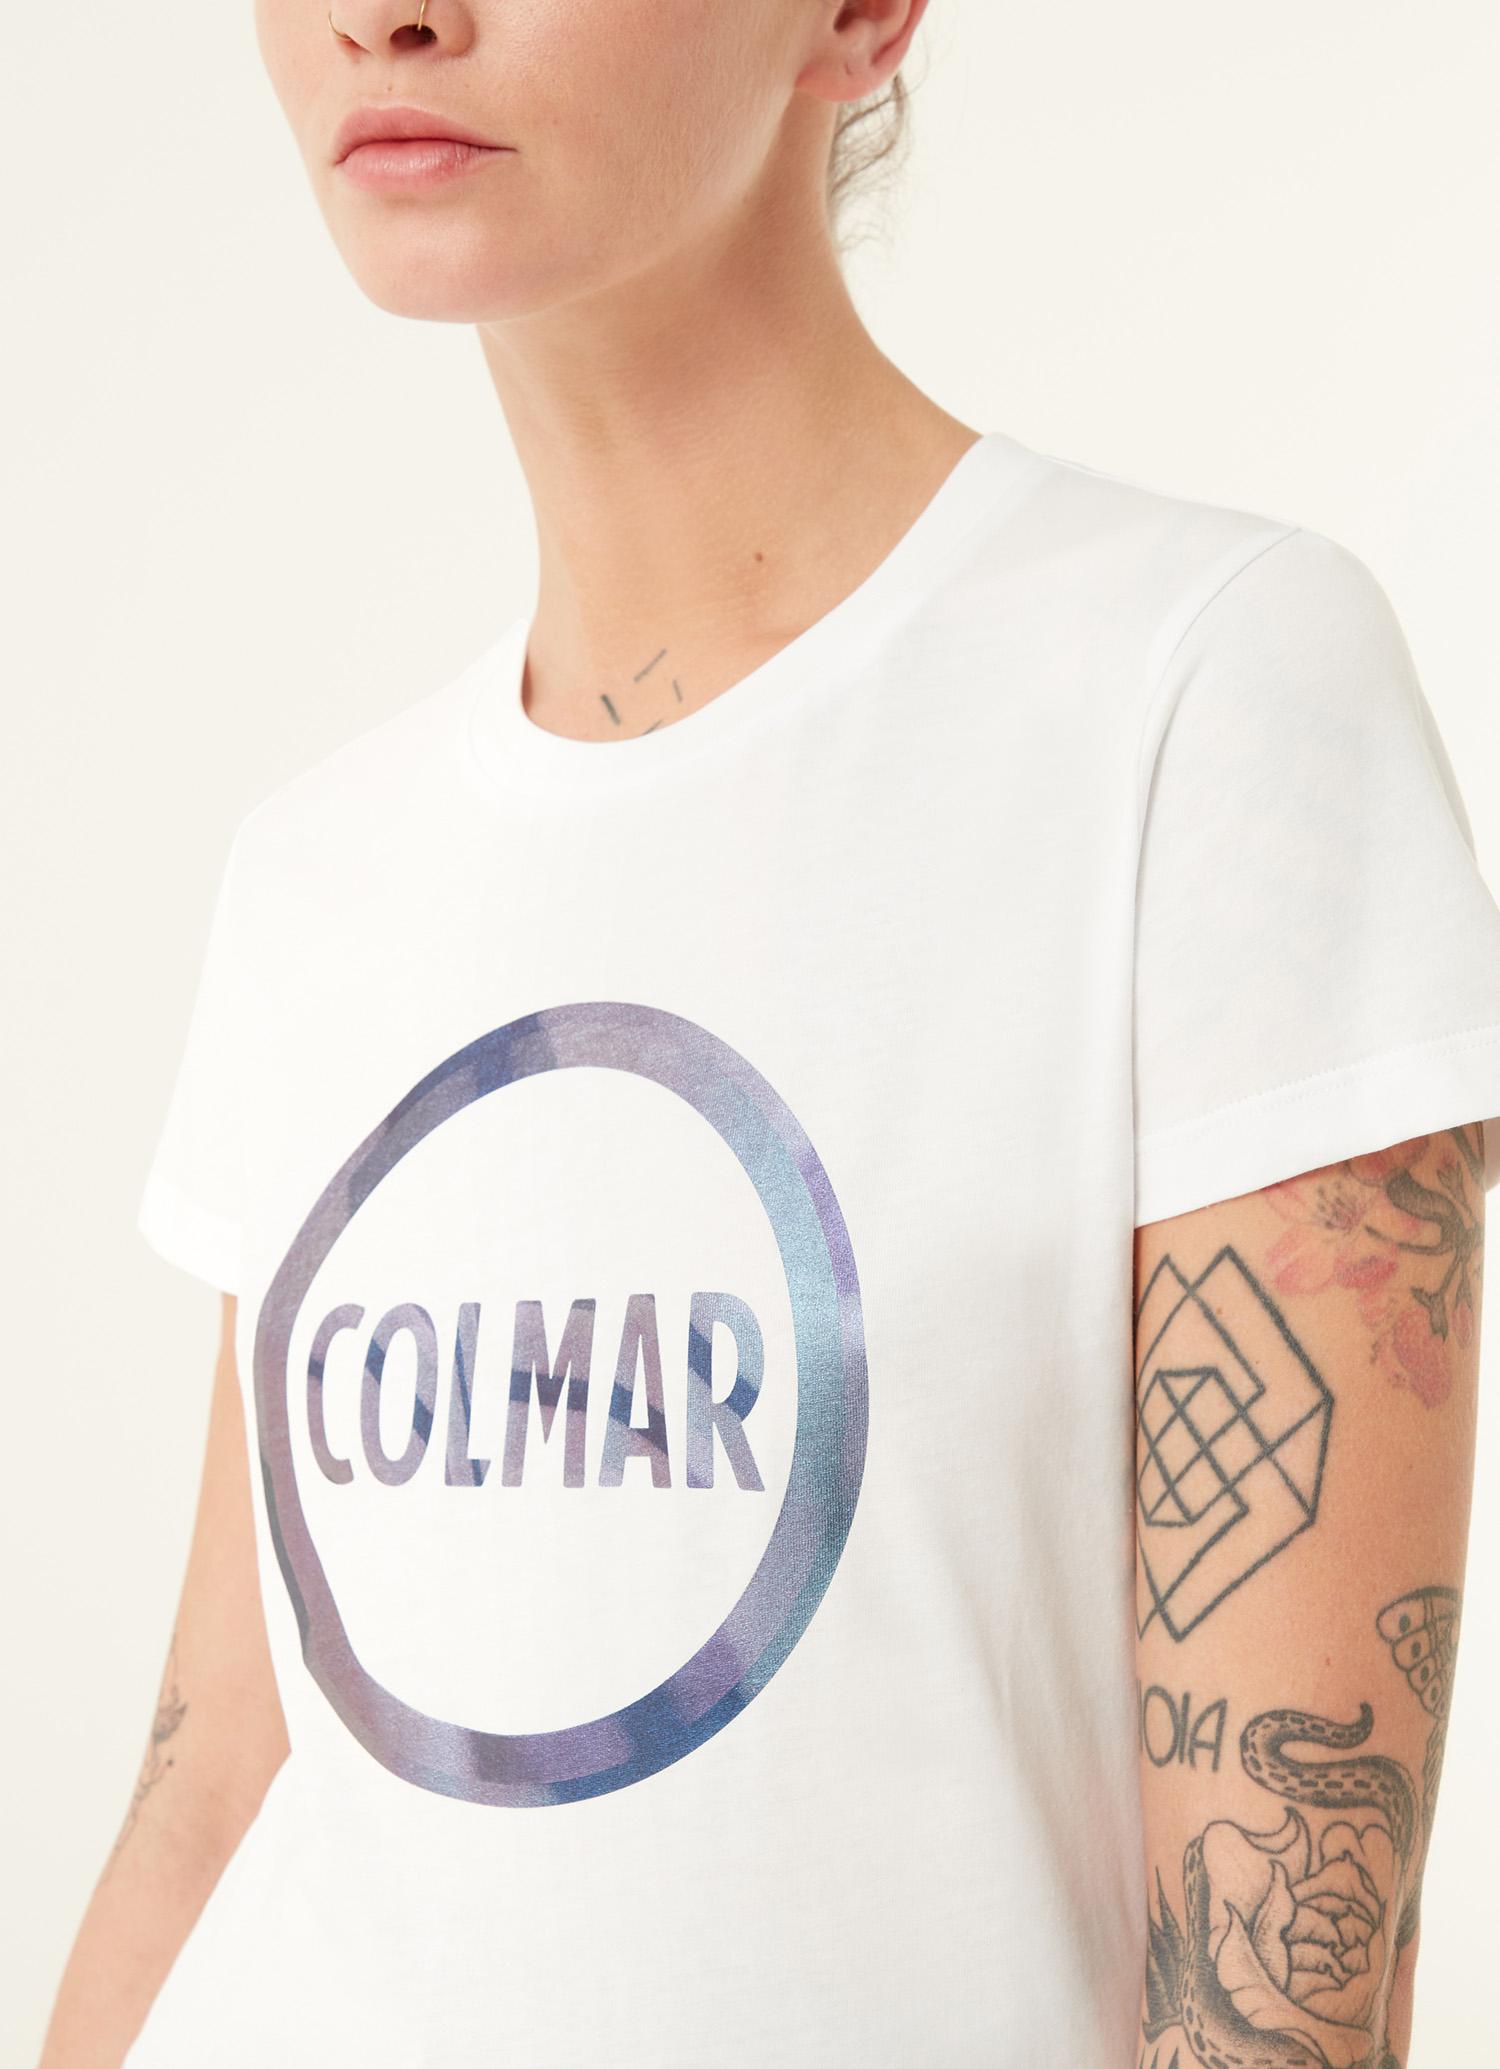 colmar original